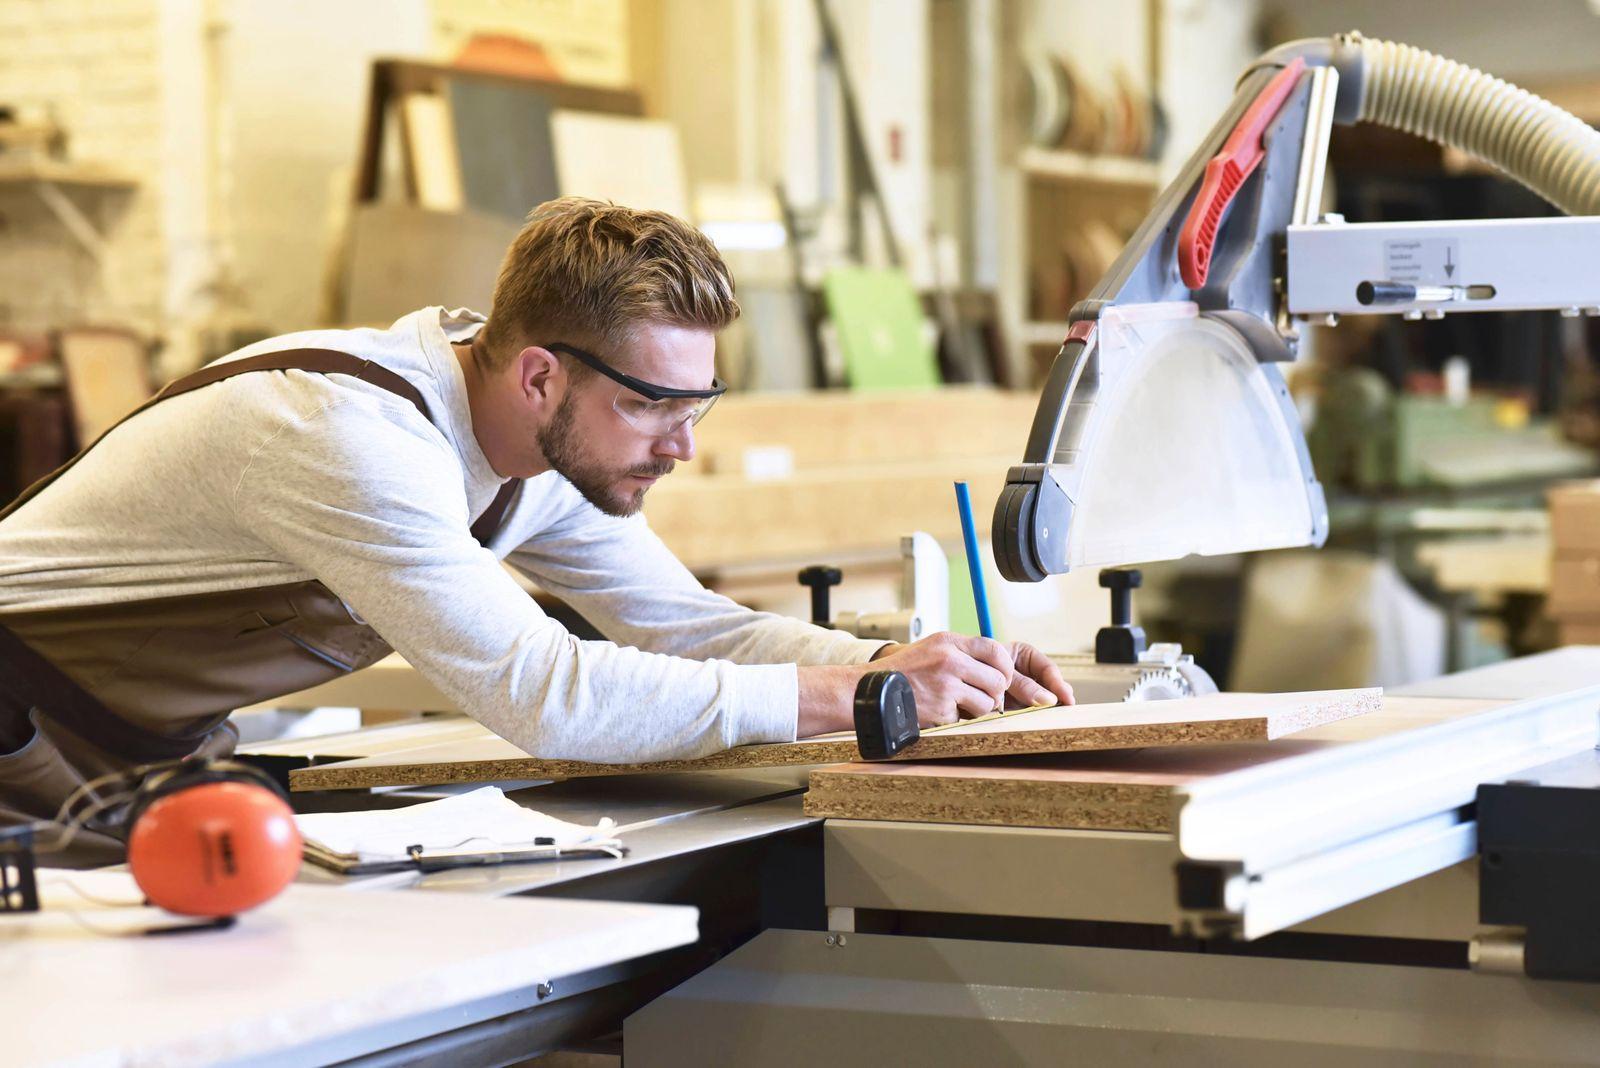 Carpenter measuring wooden boards in his workshop model released Symbolfoto property released PUBLIC